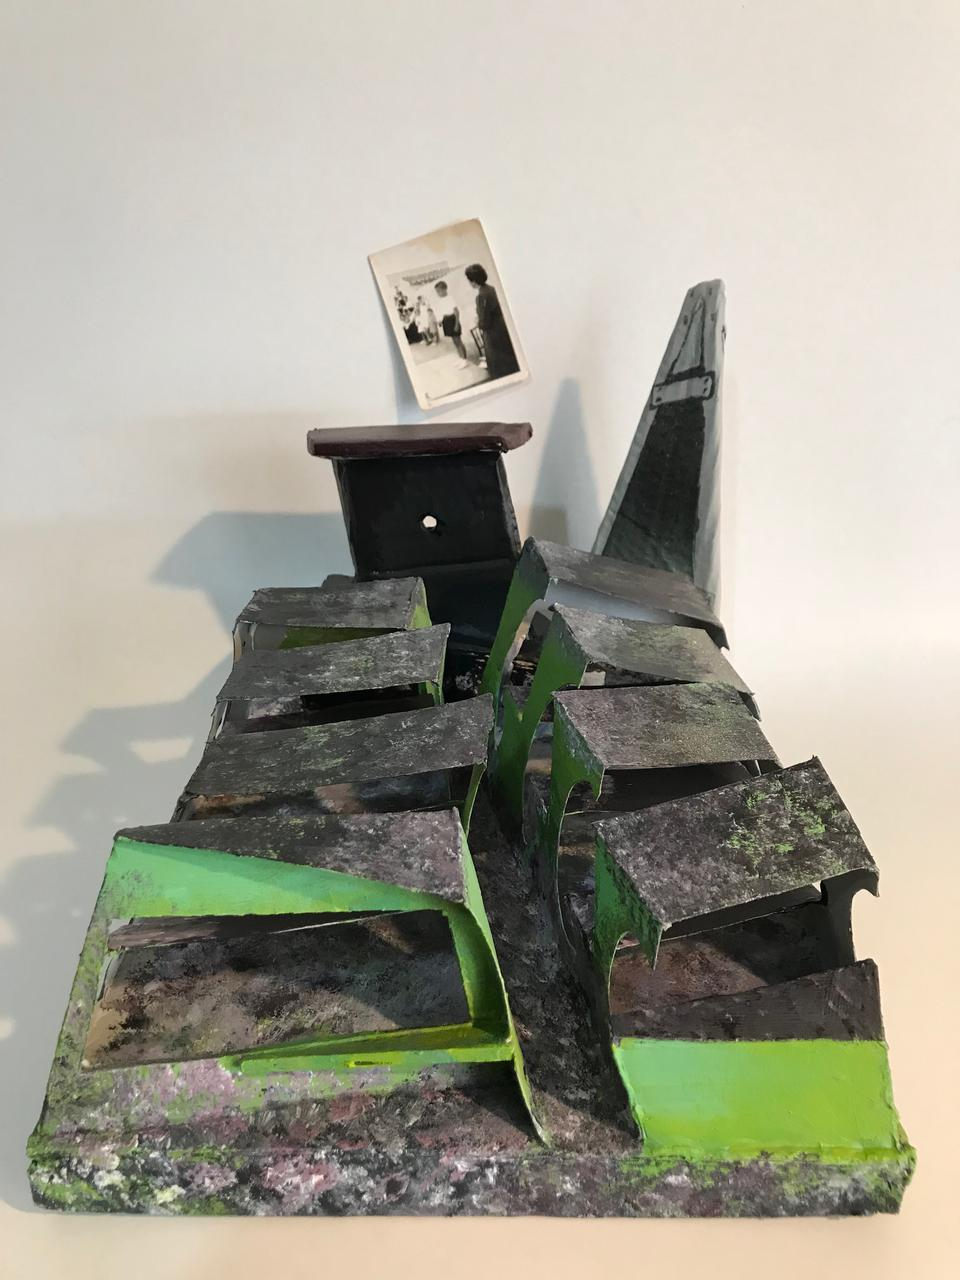 Irene Matsouki, Classroom, acrylics and oil on cardboard wood on plexiglass, 40 x 30 x 30 cm